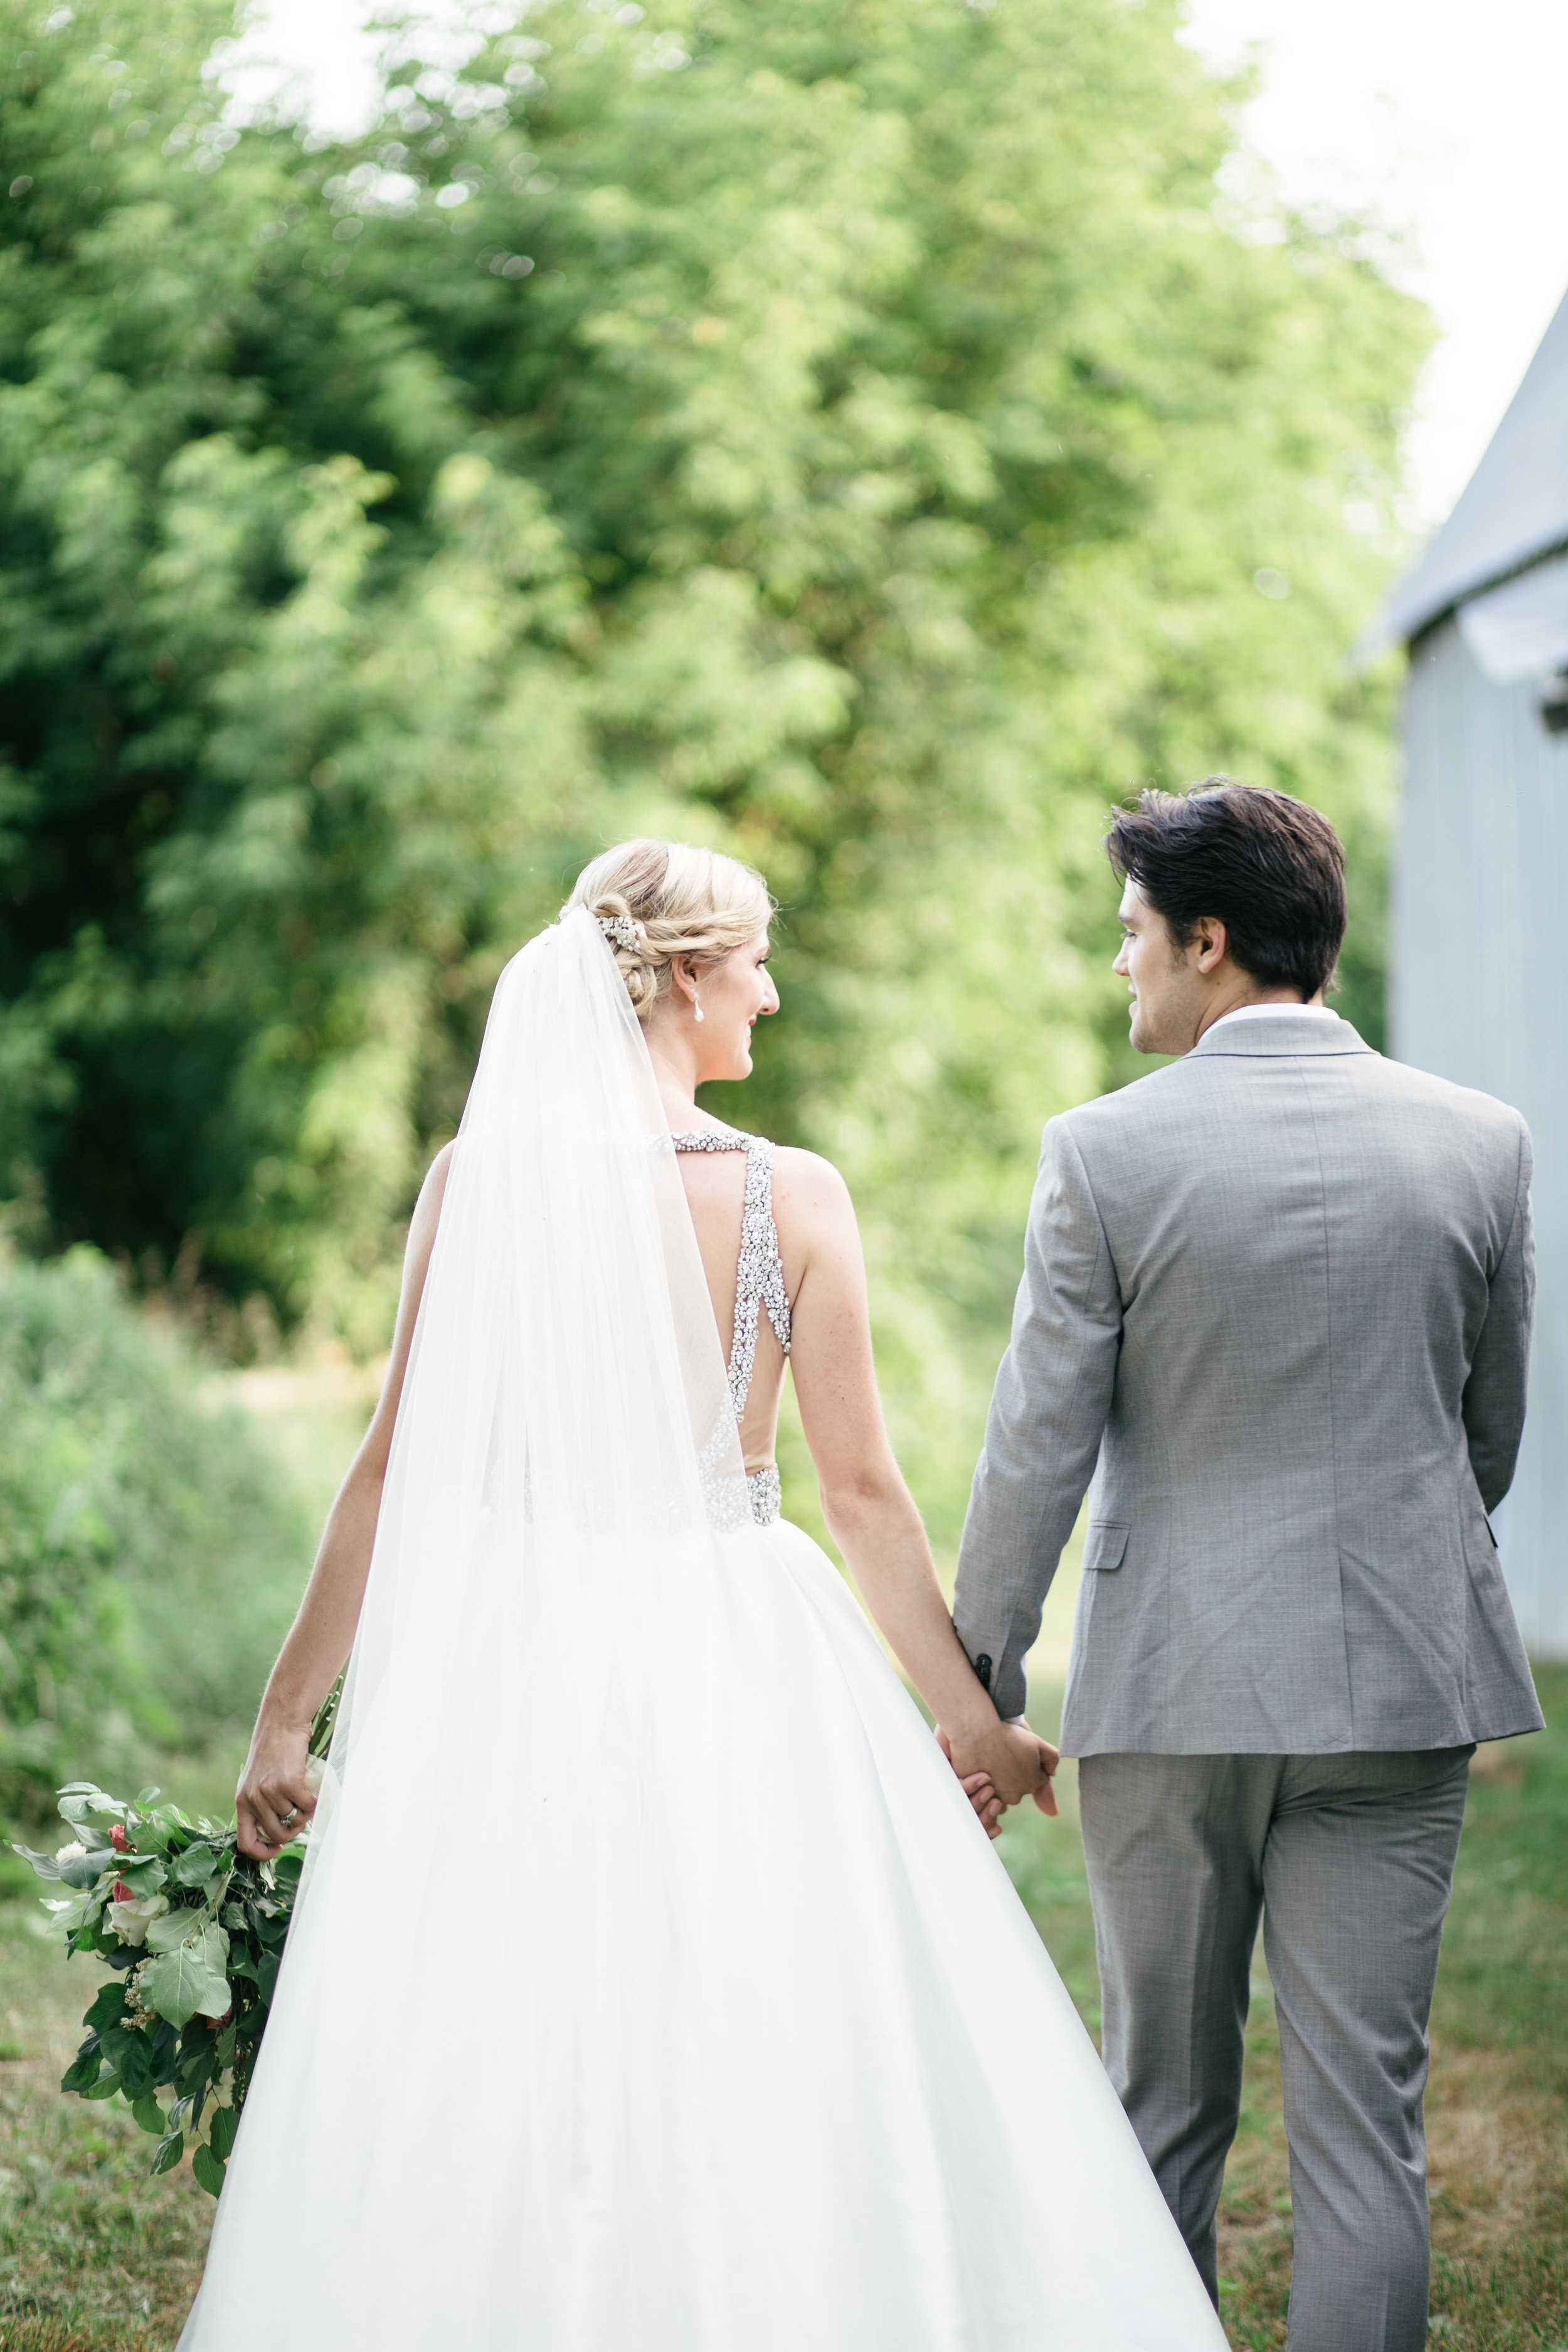 Caroline & Jon Final Images-38.jpg